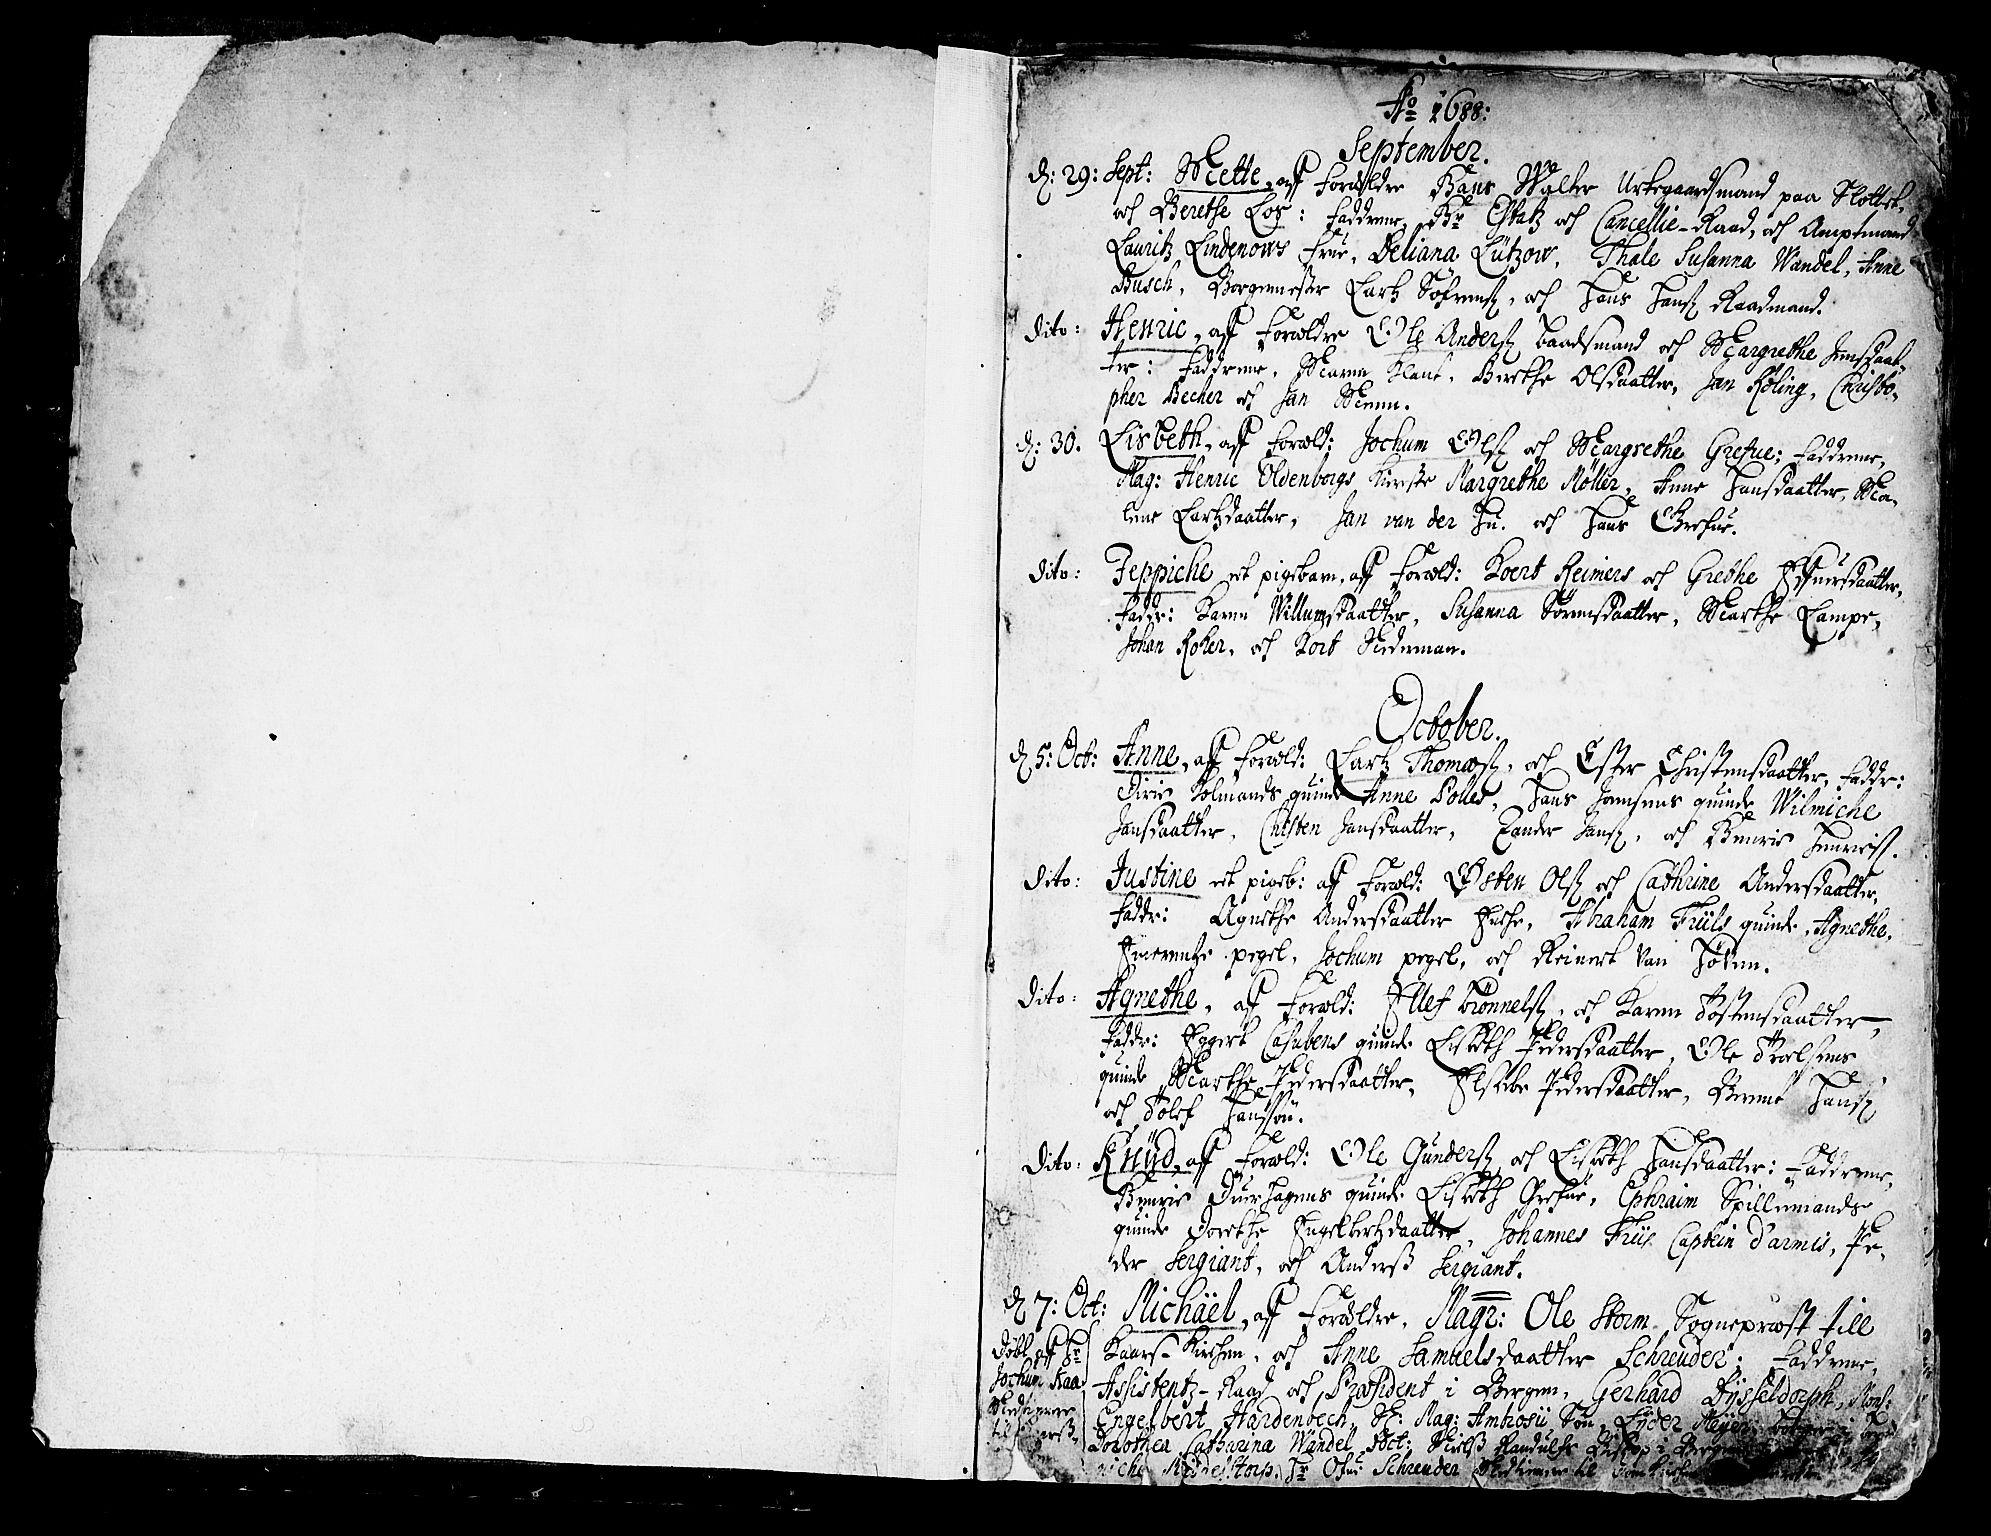 SAB, Korskirken Sokneprestembete, H/Haa/L0002: Ministerialbok nr. A 2, 1688-1697, s. 0-1